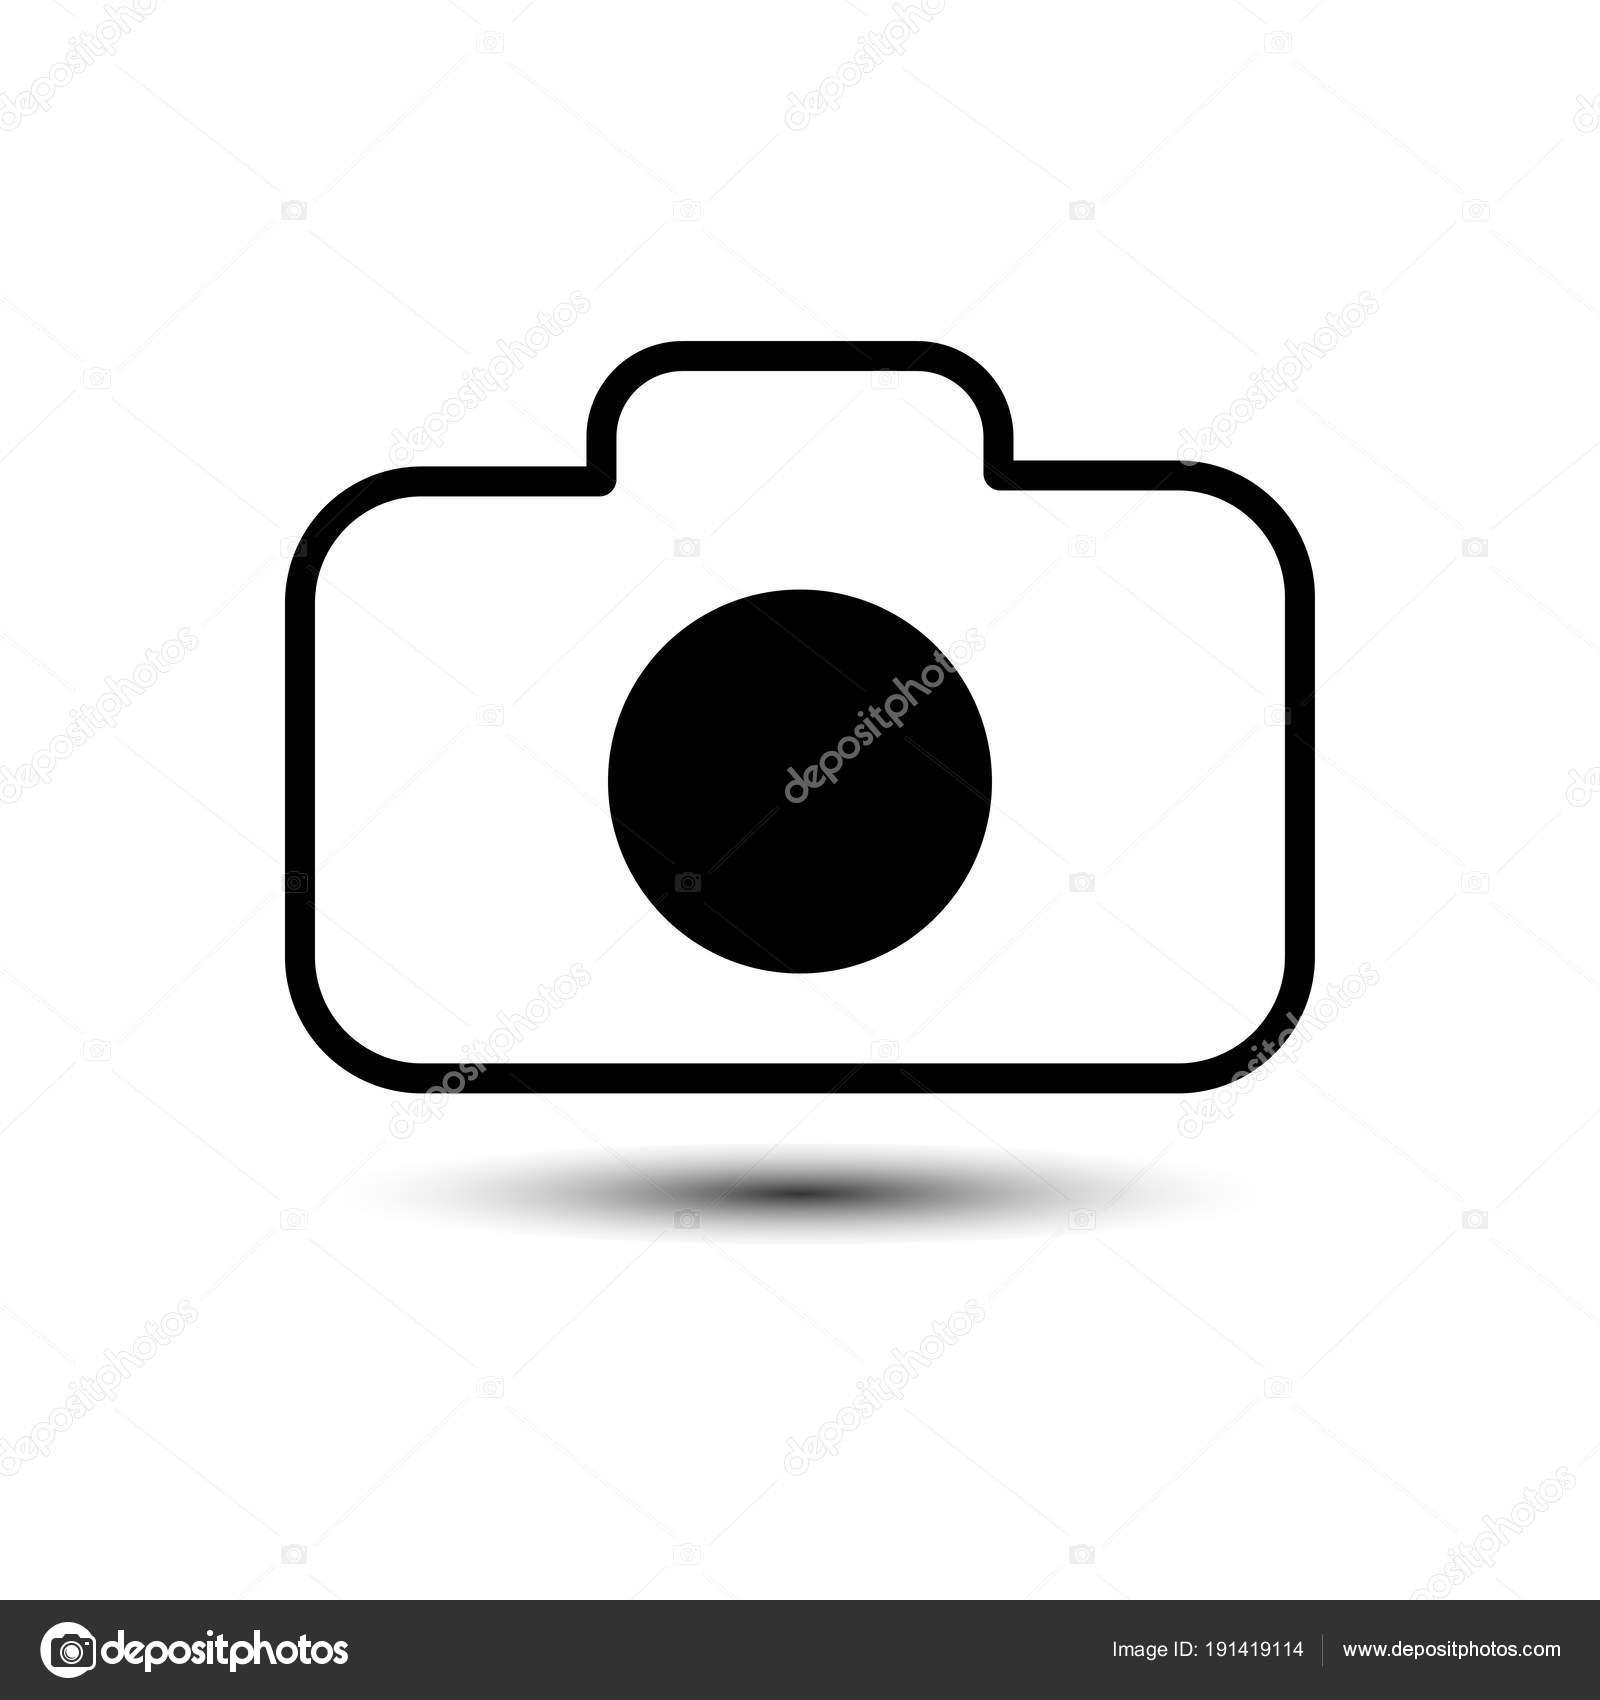 Web камера на вашем сайте сервисный центр sony vaio санкт петербург